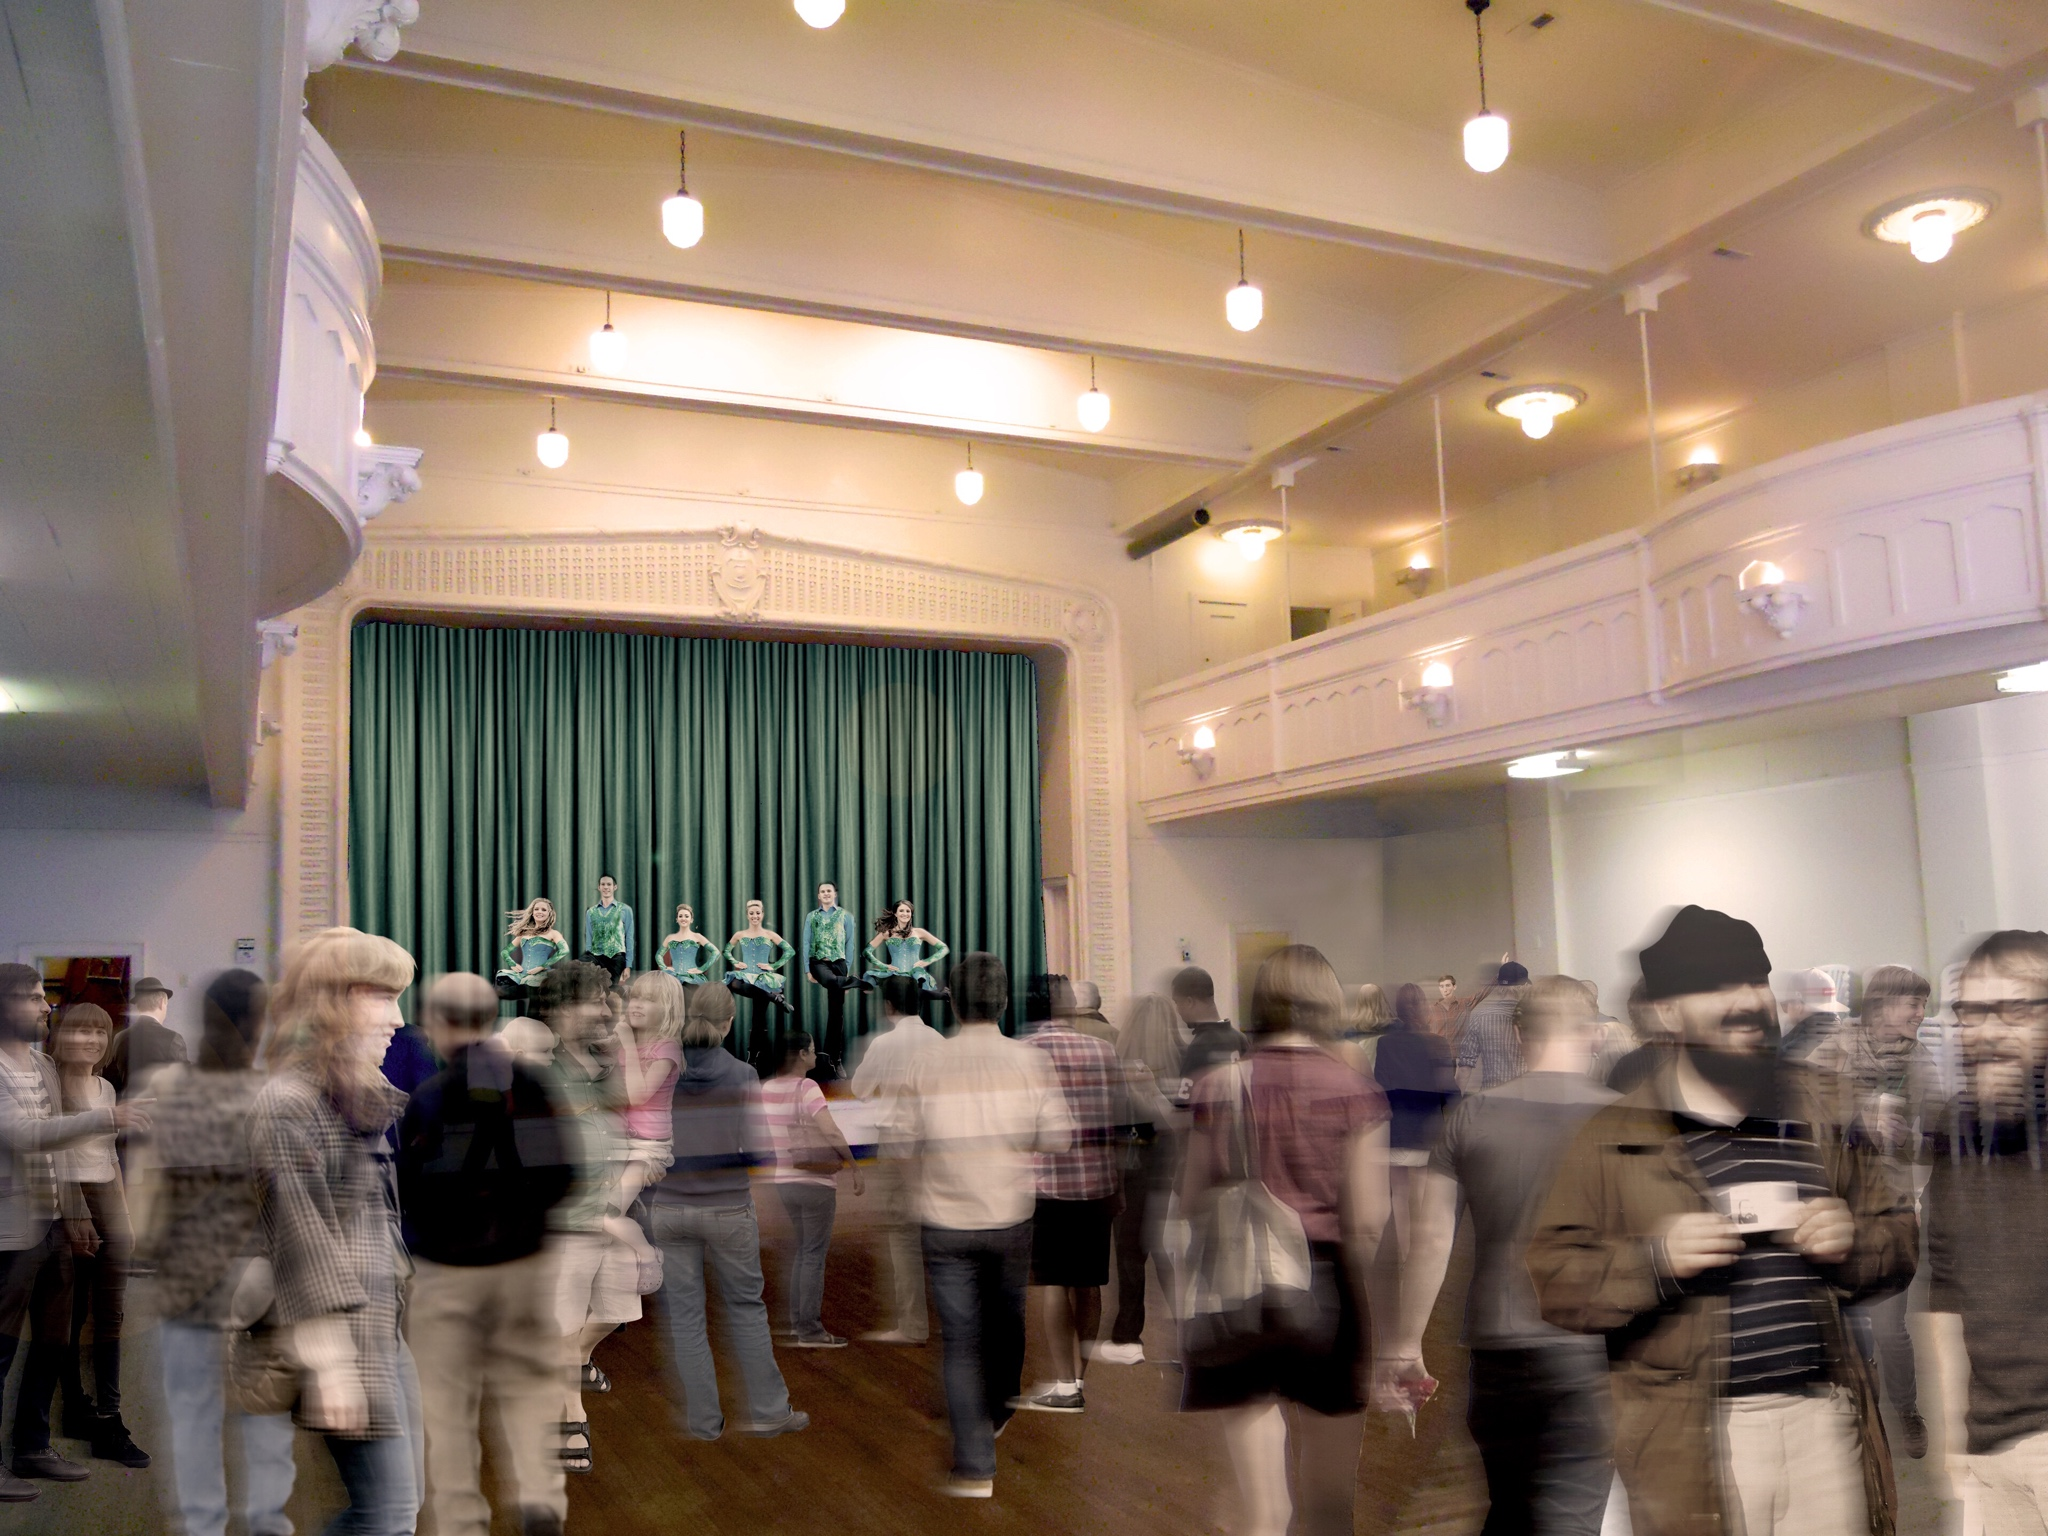 KCIC Hall Interior